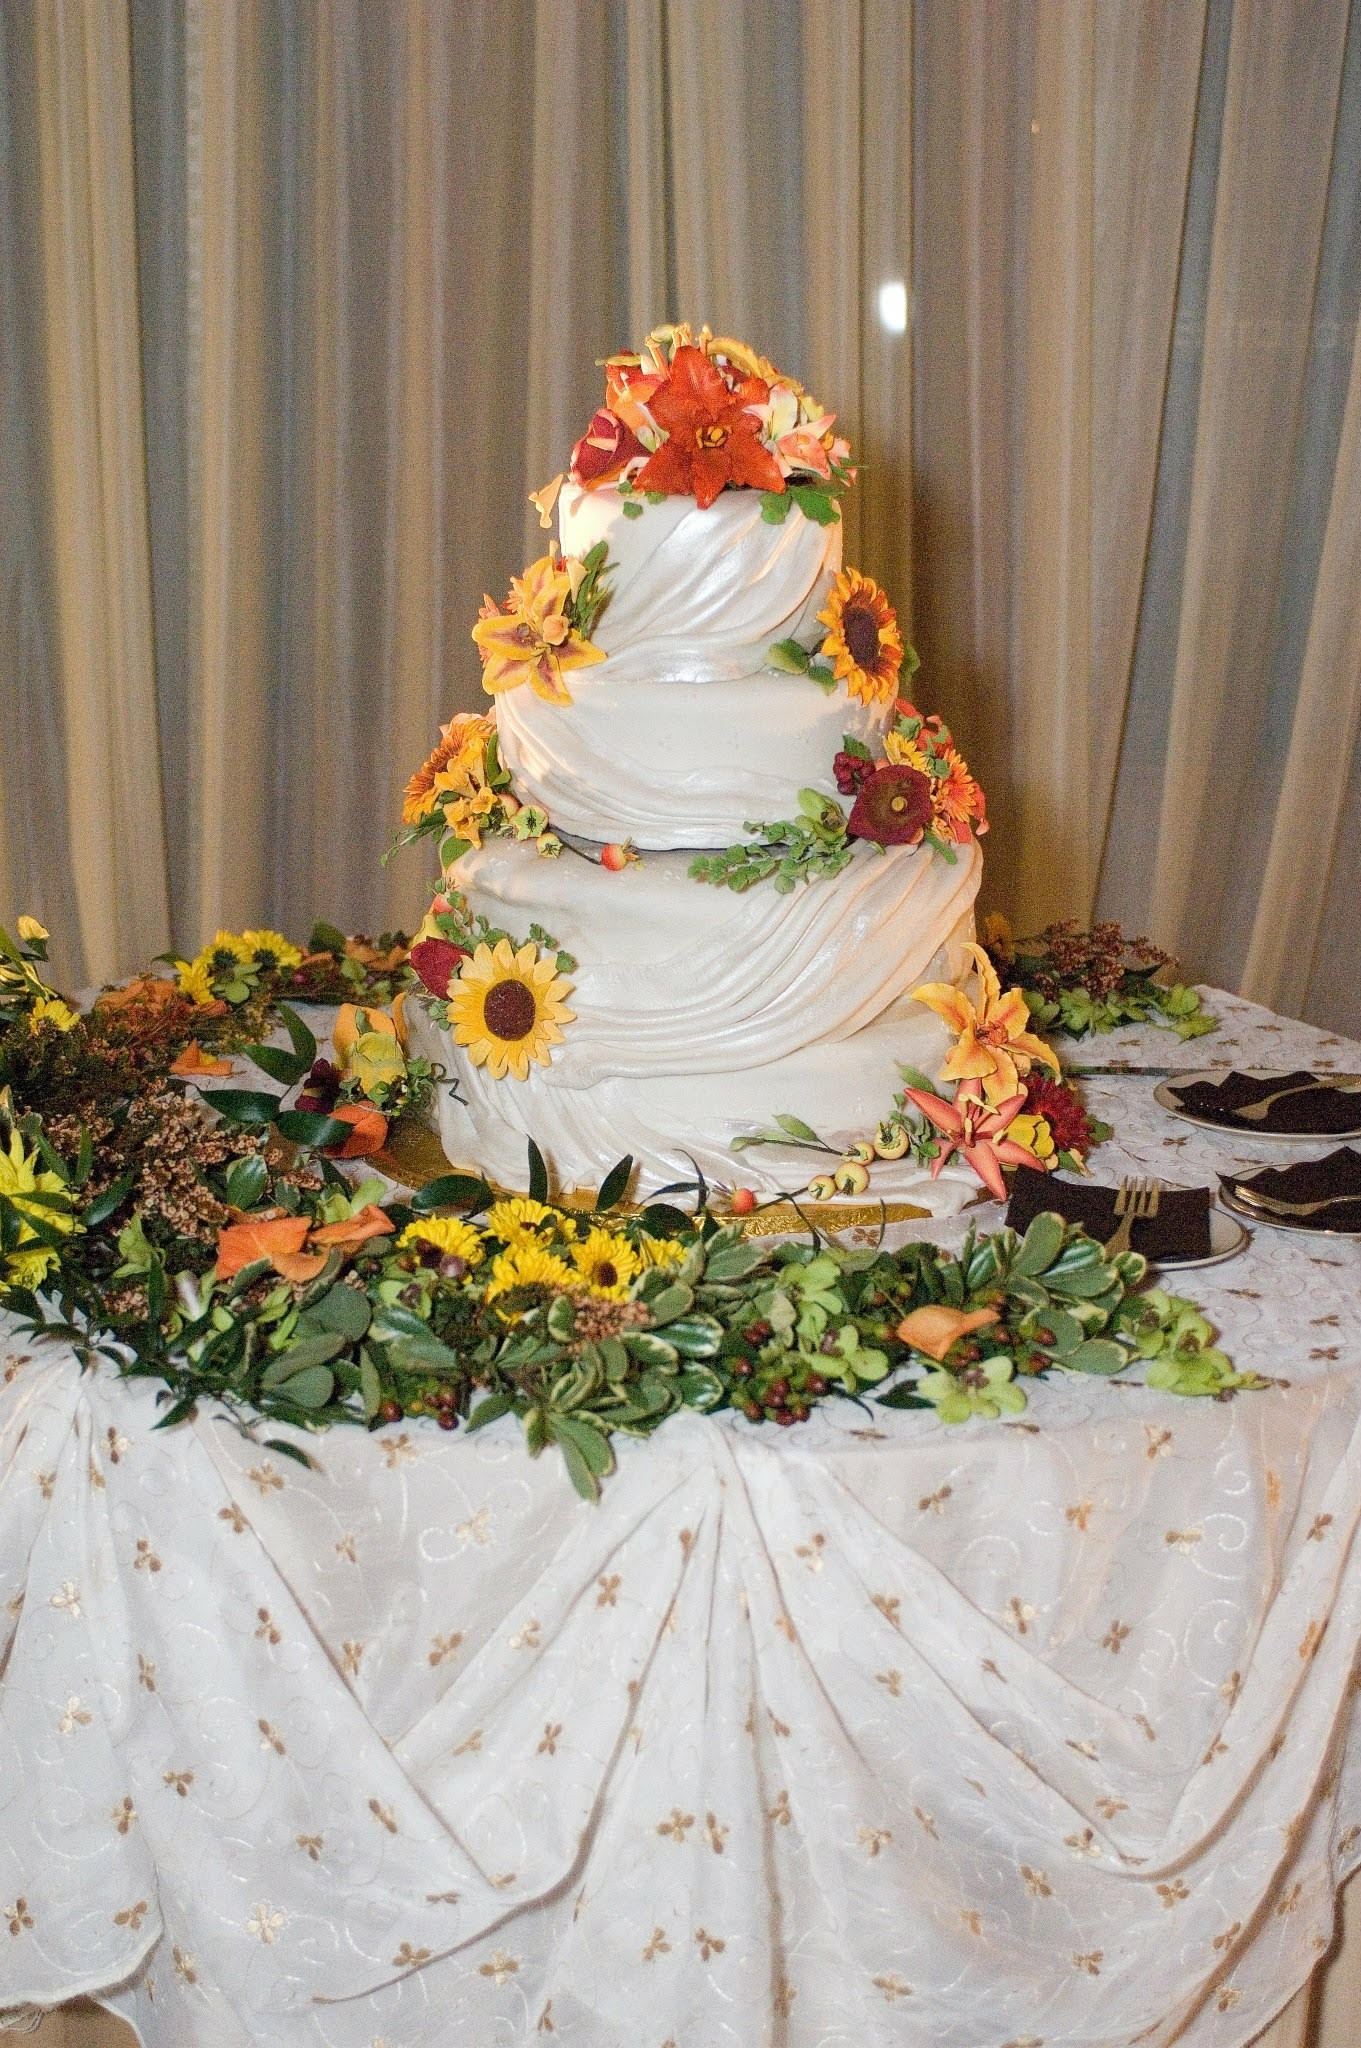 pa-wedding-linens-81.jpg